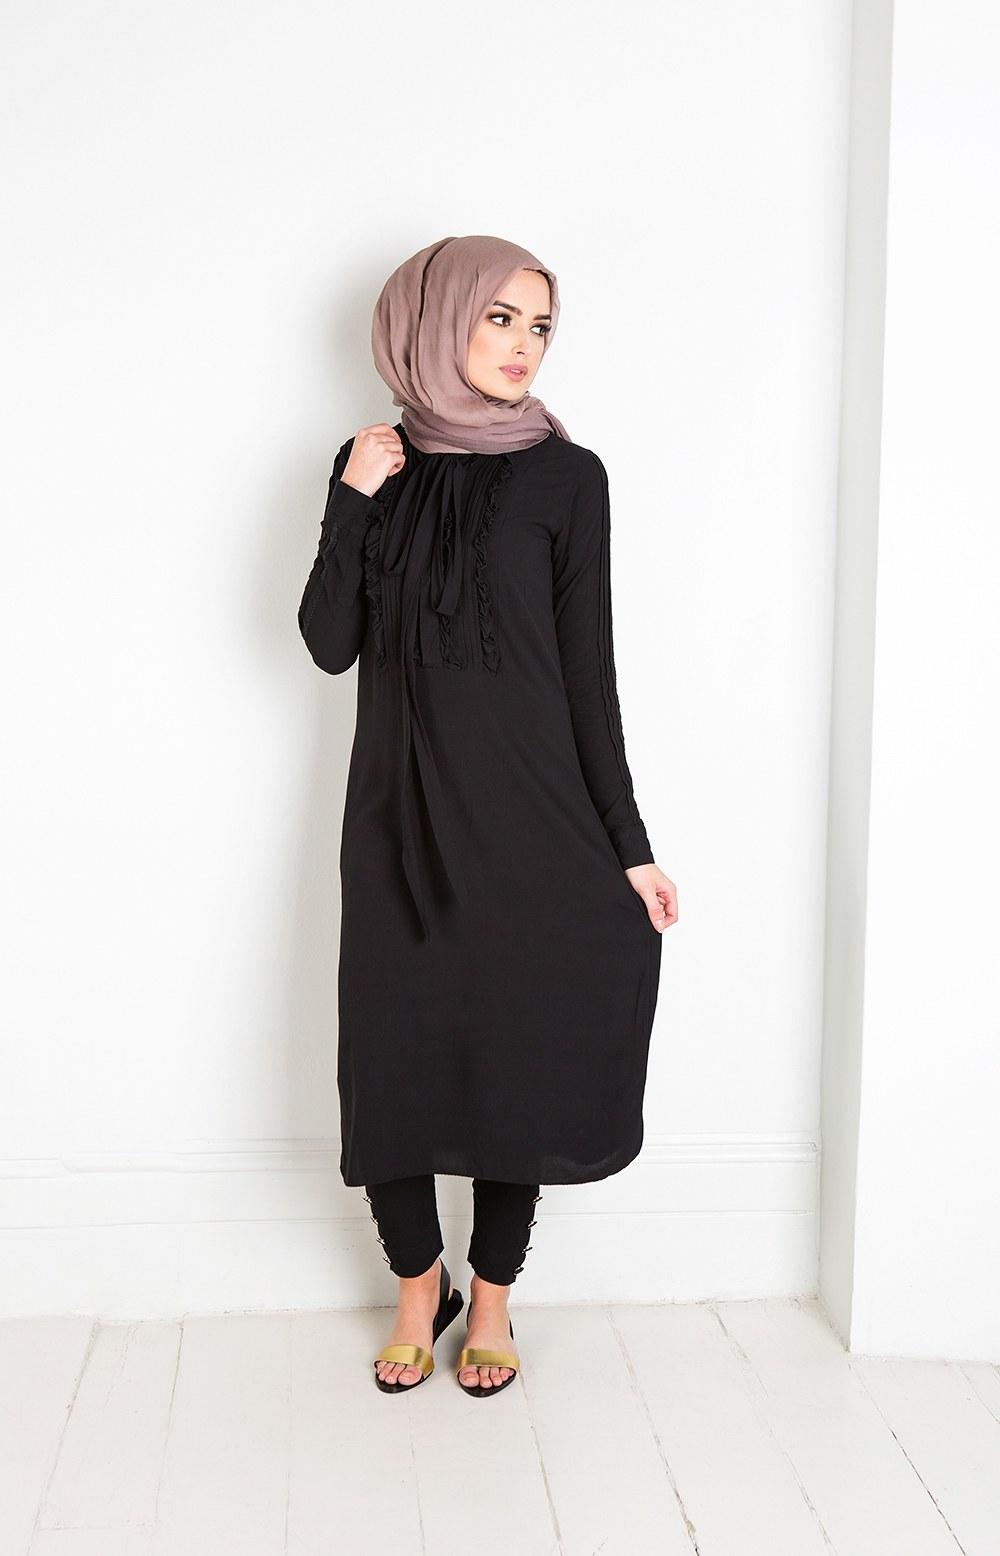 Design Baju Lebaran Wanita Wddj 25 Trend Model Baju Muslim Lebaran 2018 Simple & Modis